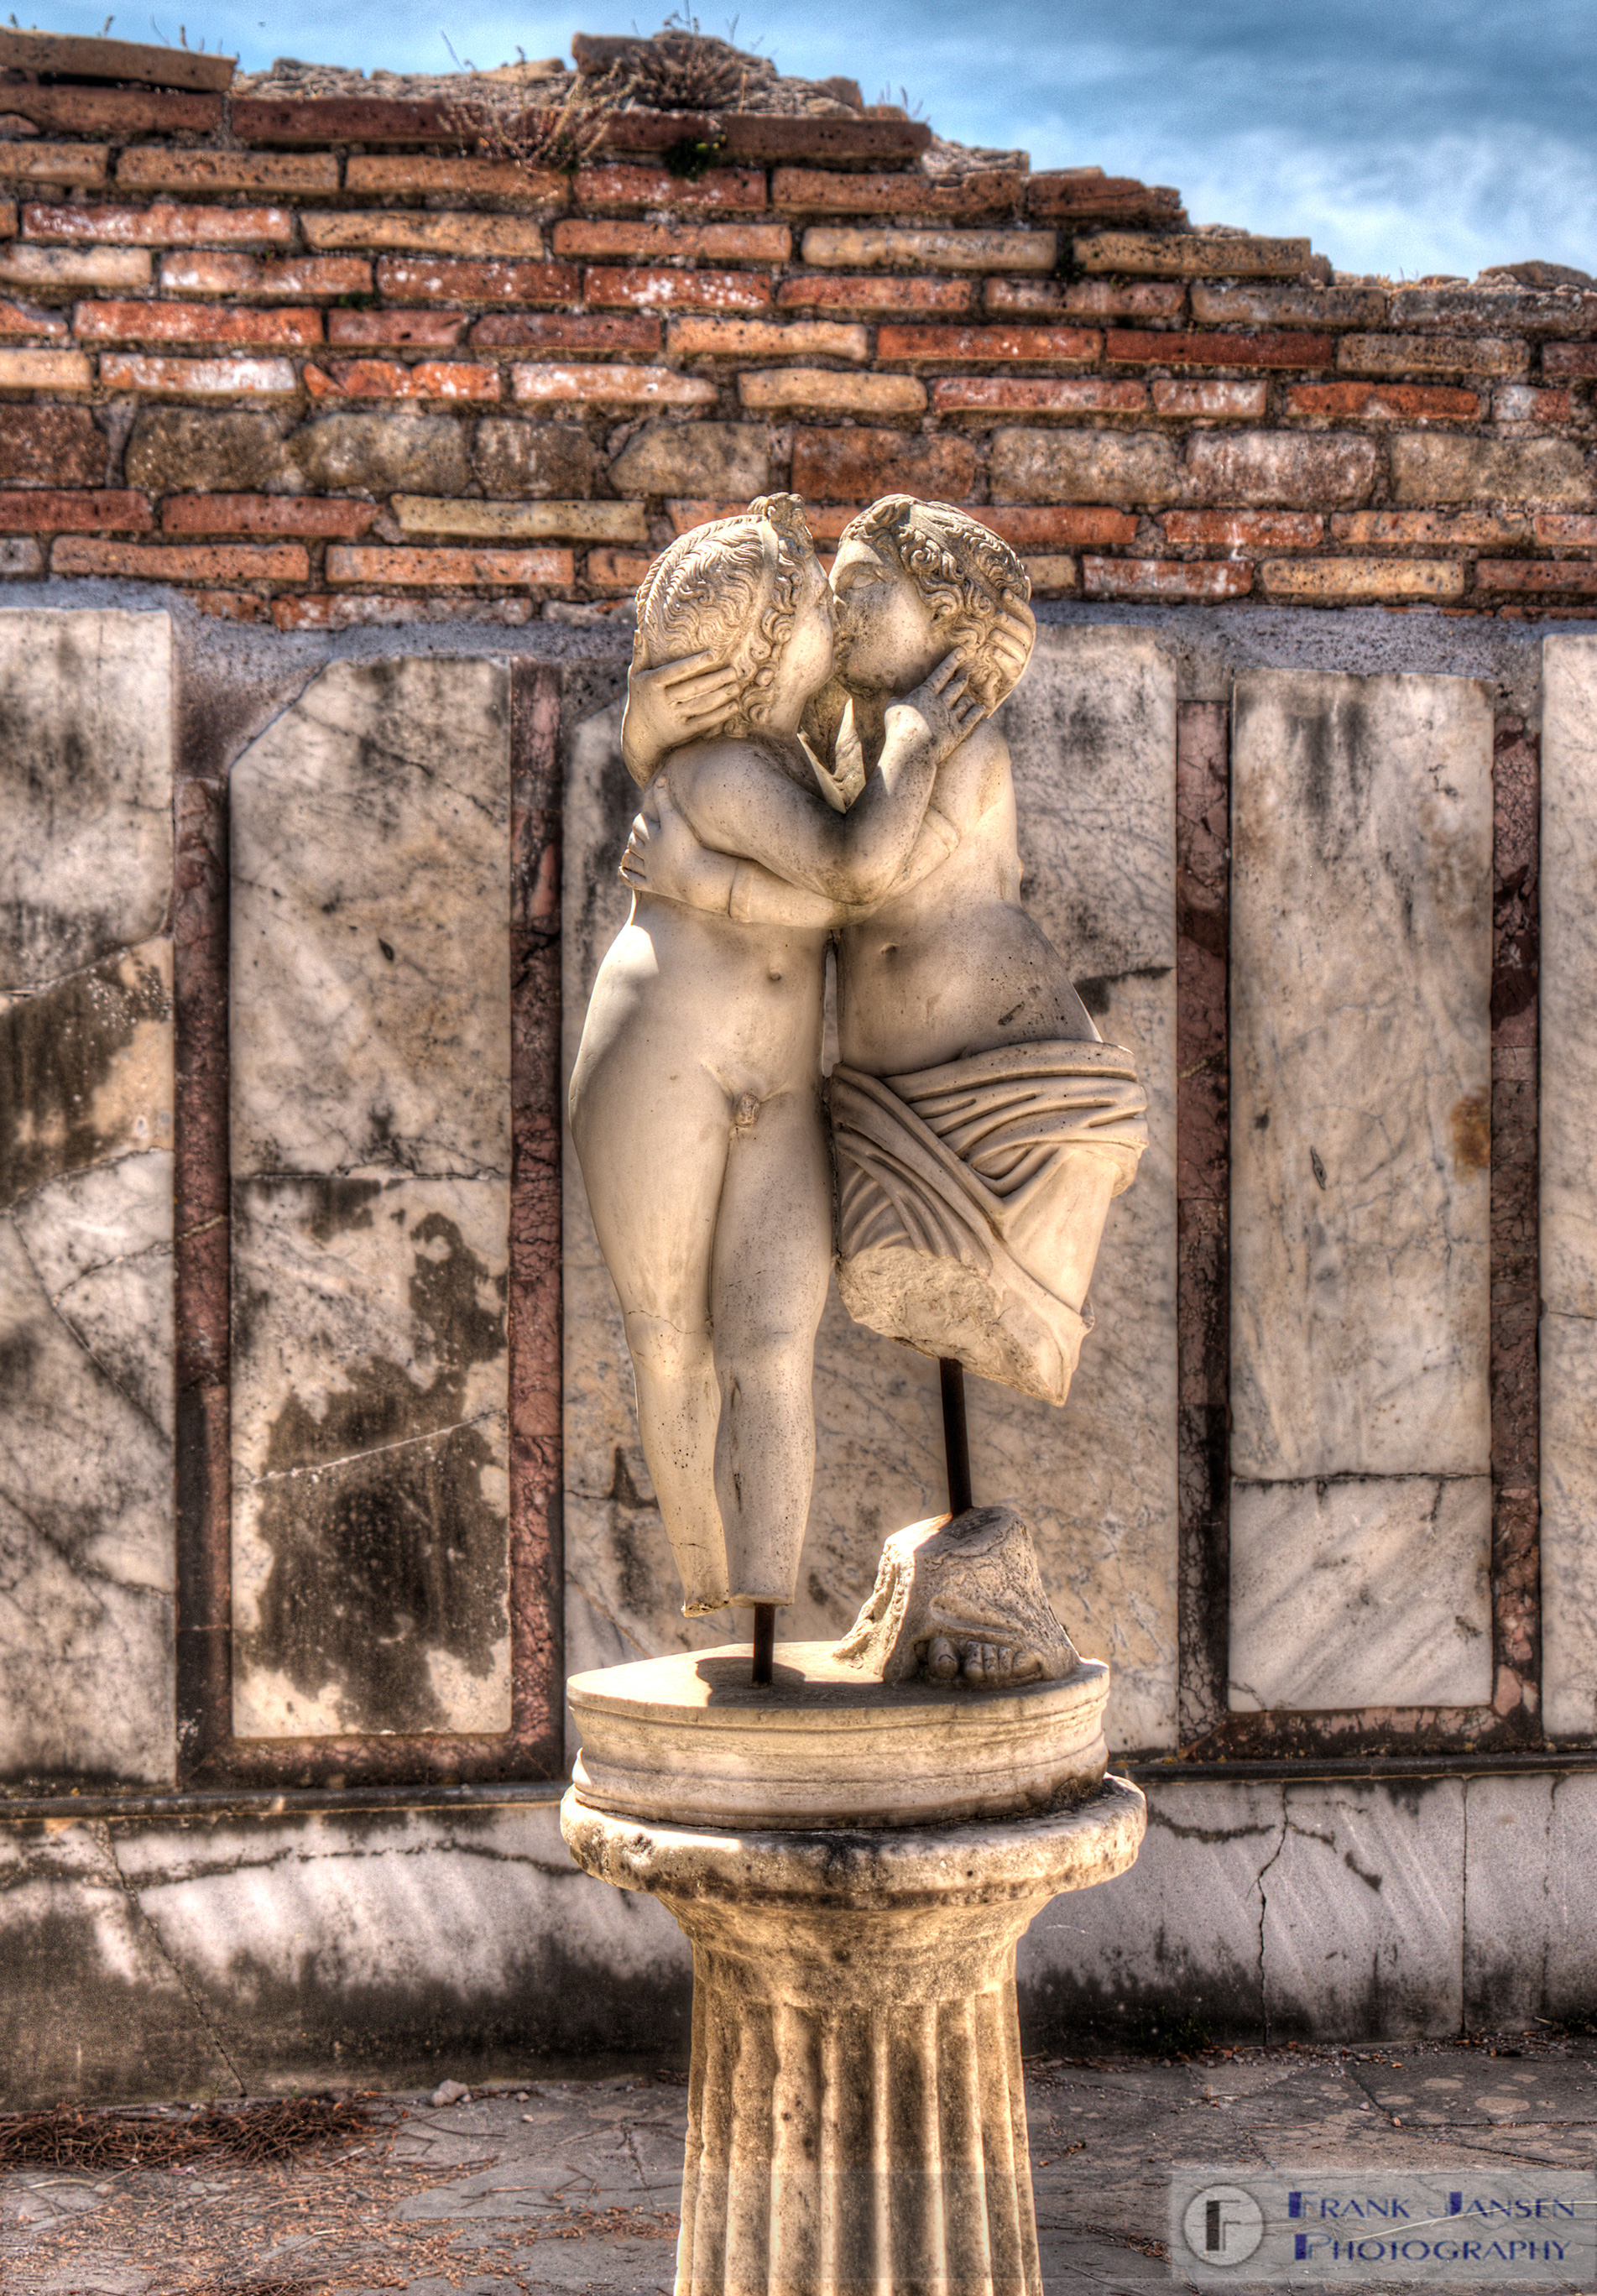 20170518-Scavi-di-Ostia-Antica-Cupid-e-Psyche_DSF1116_7_8_tonemapped